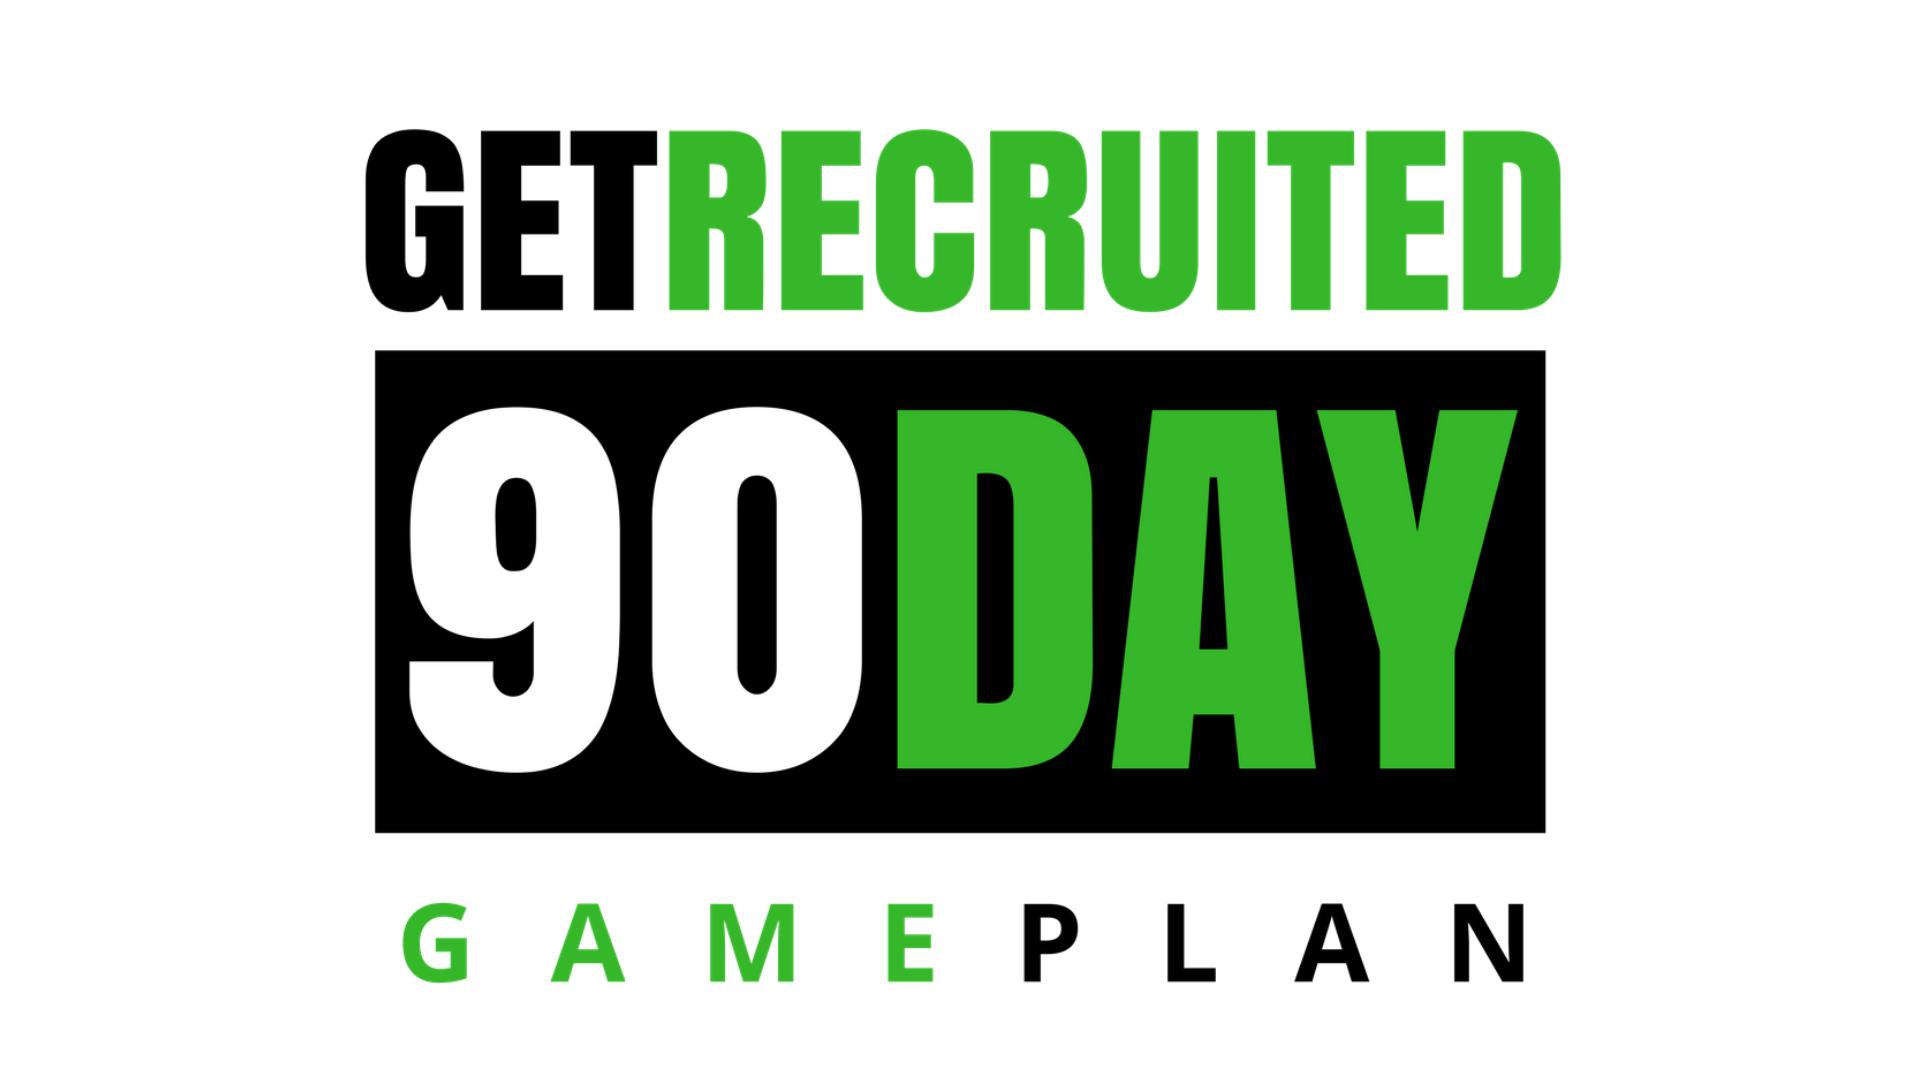 Get Recruited 90 Day Gameplan